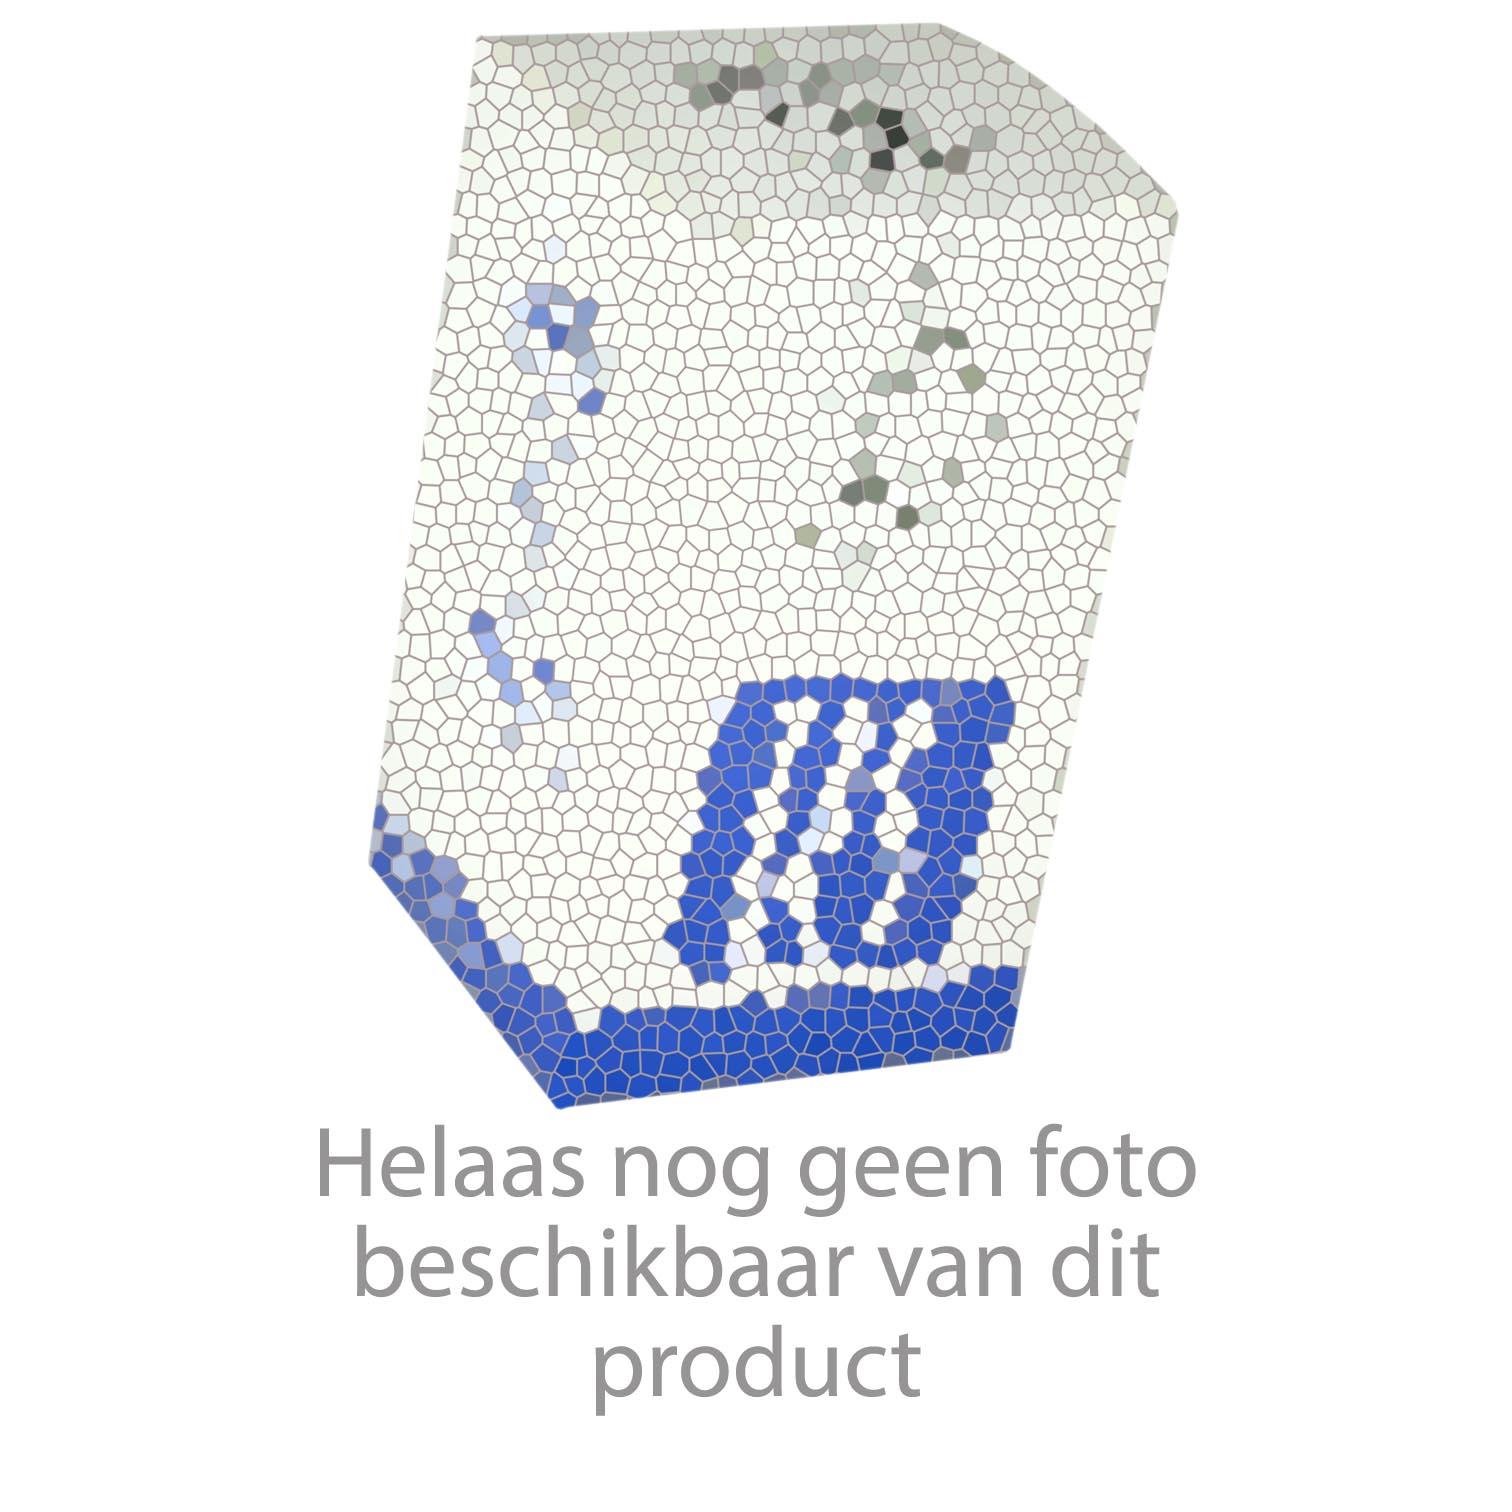 Kwc Onderdelen Ono Keukenkraan 3-Gats 1-Greeps Aparte Semipro Spoeldouche Artikelnummer 10.153.423.000Fl